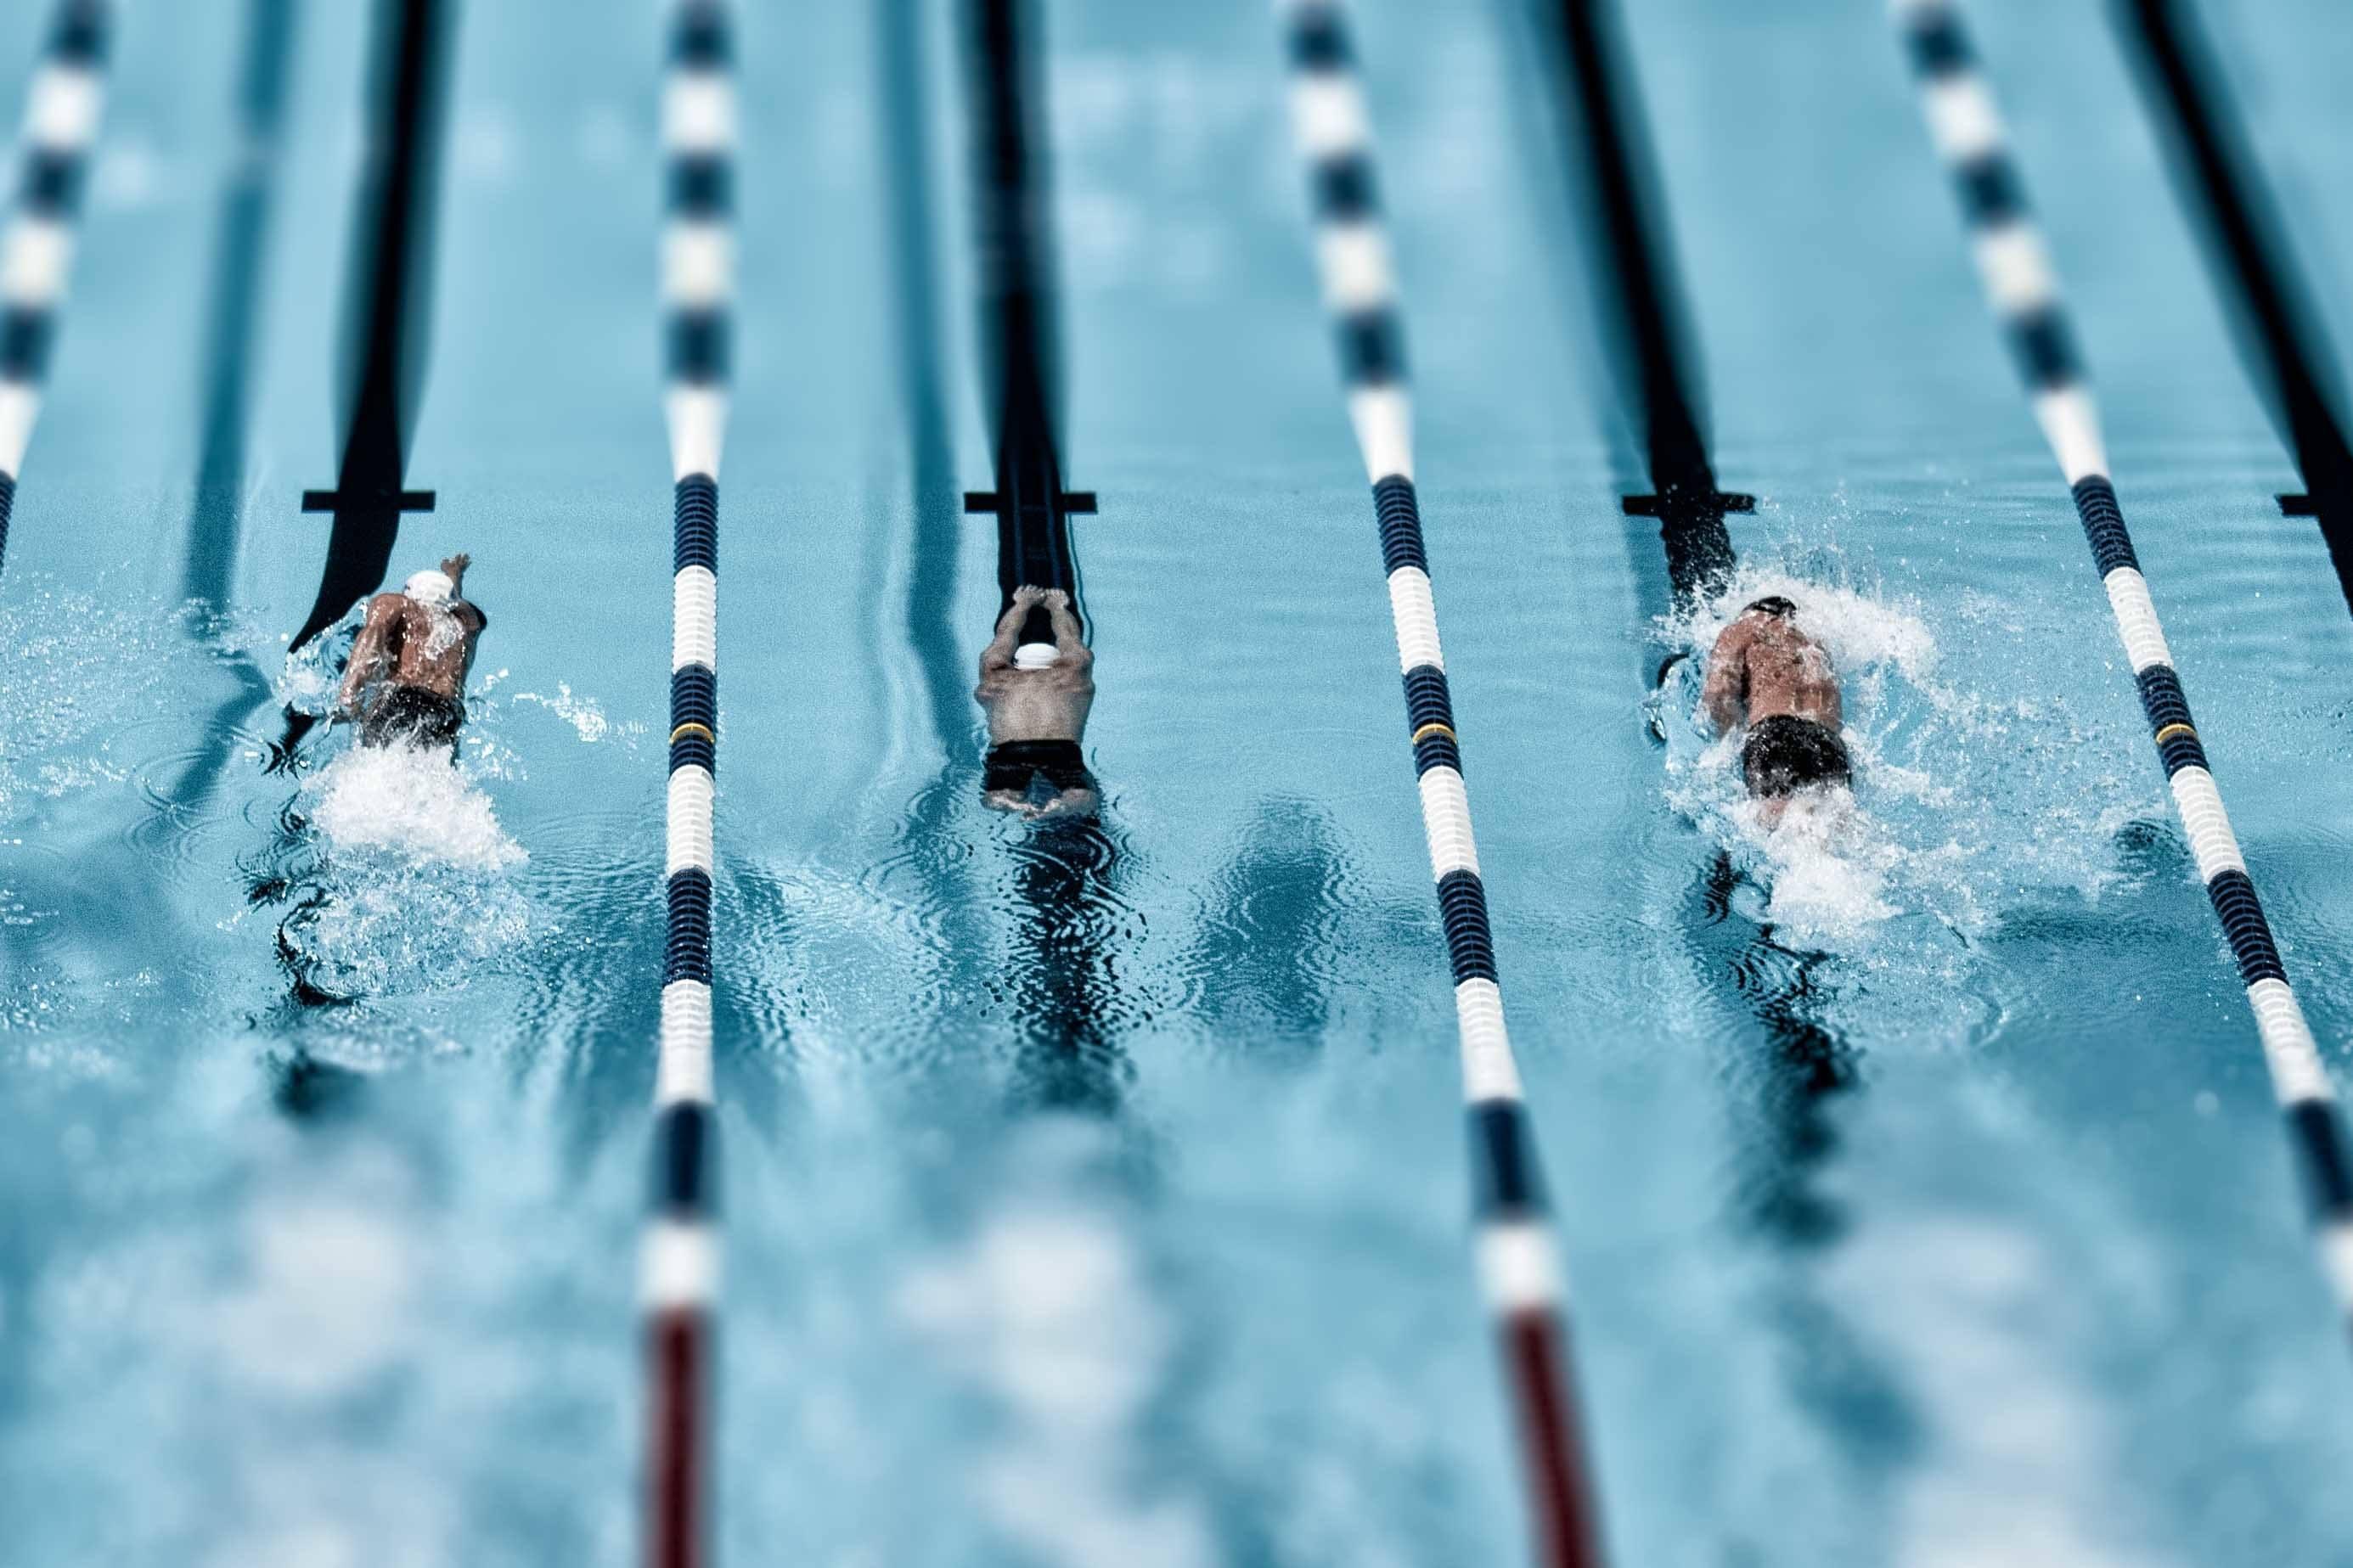 2580cd199 Faroe Islands Will Send Five Swimmers to European Championship